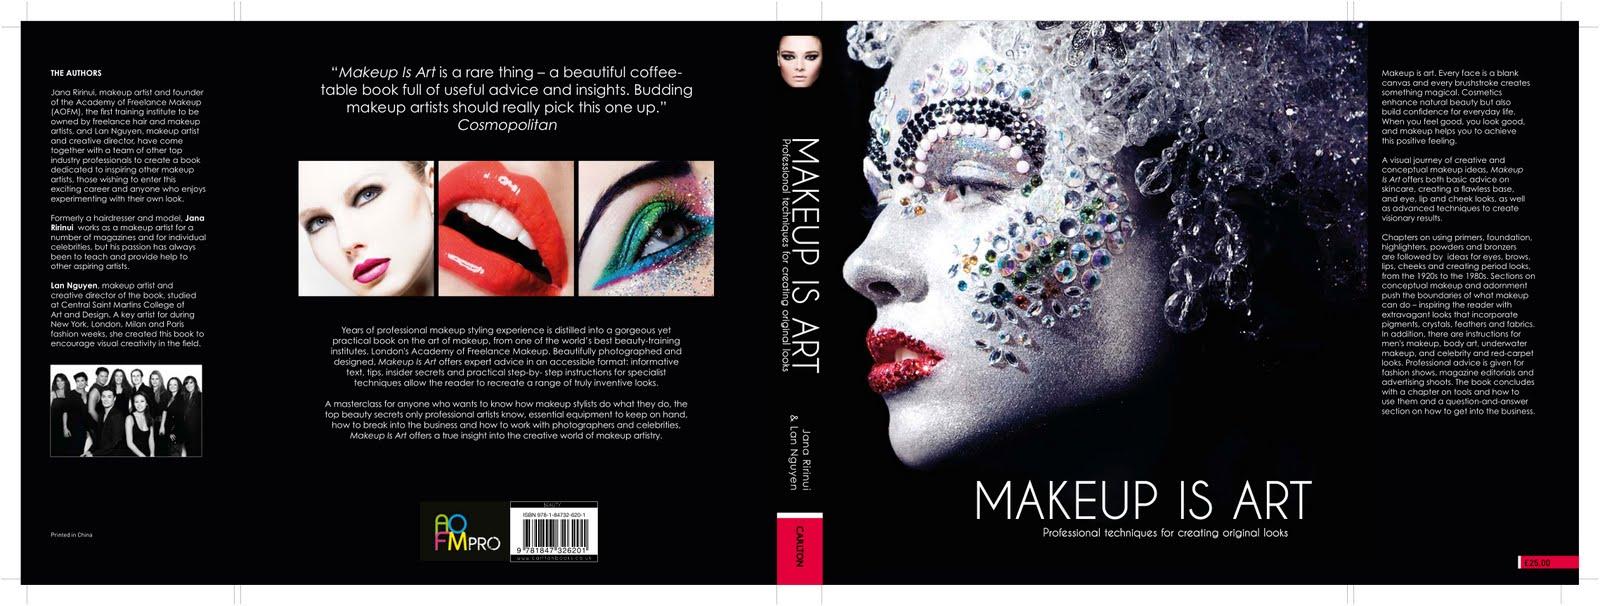 lan nguyen make up artist make up is second edition